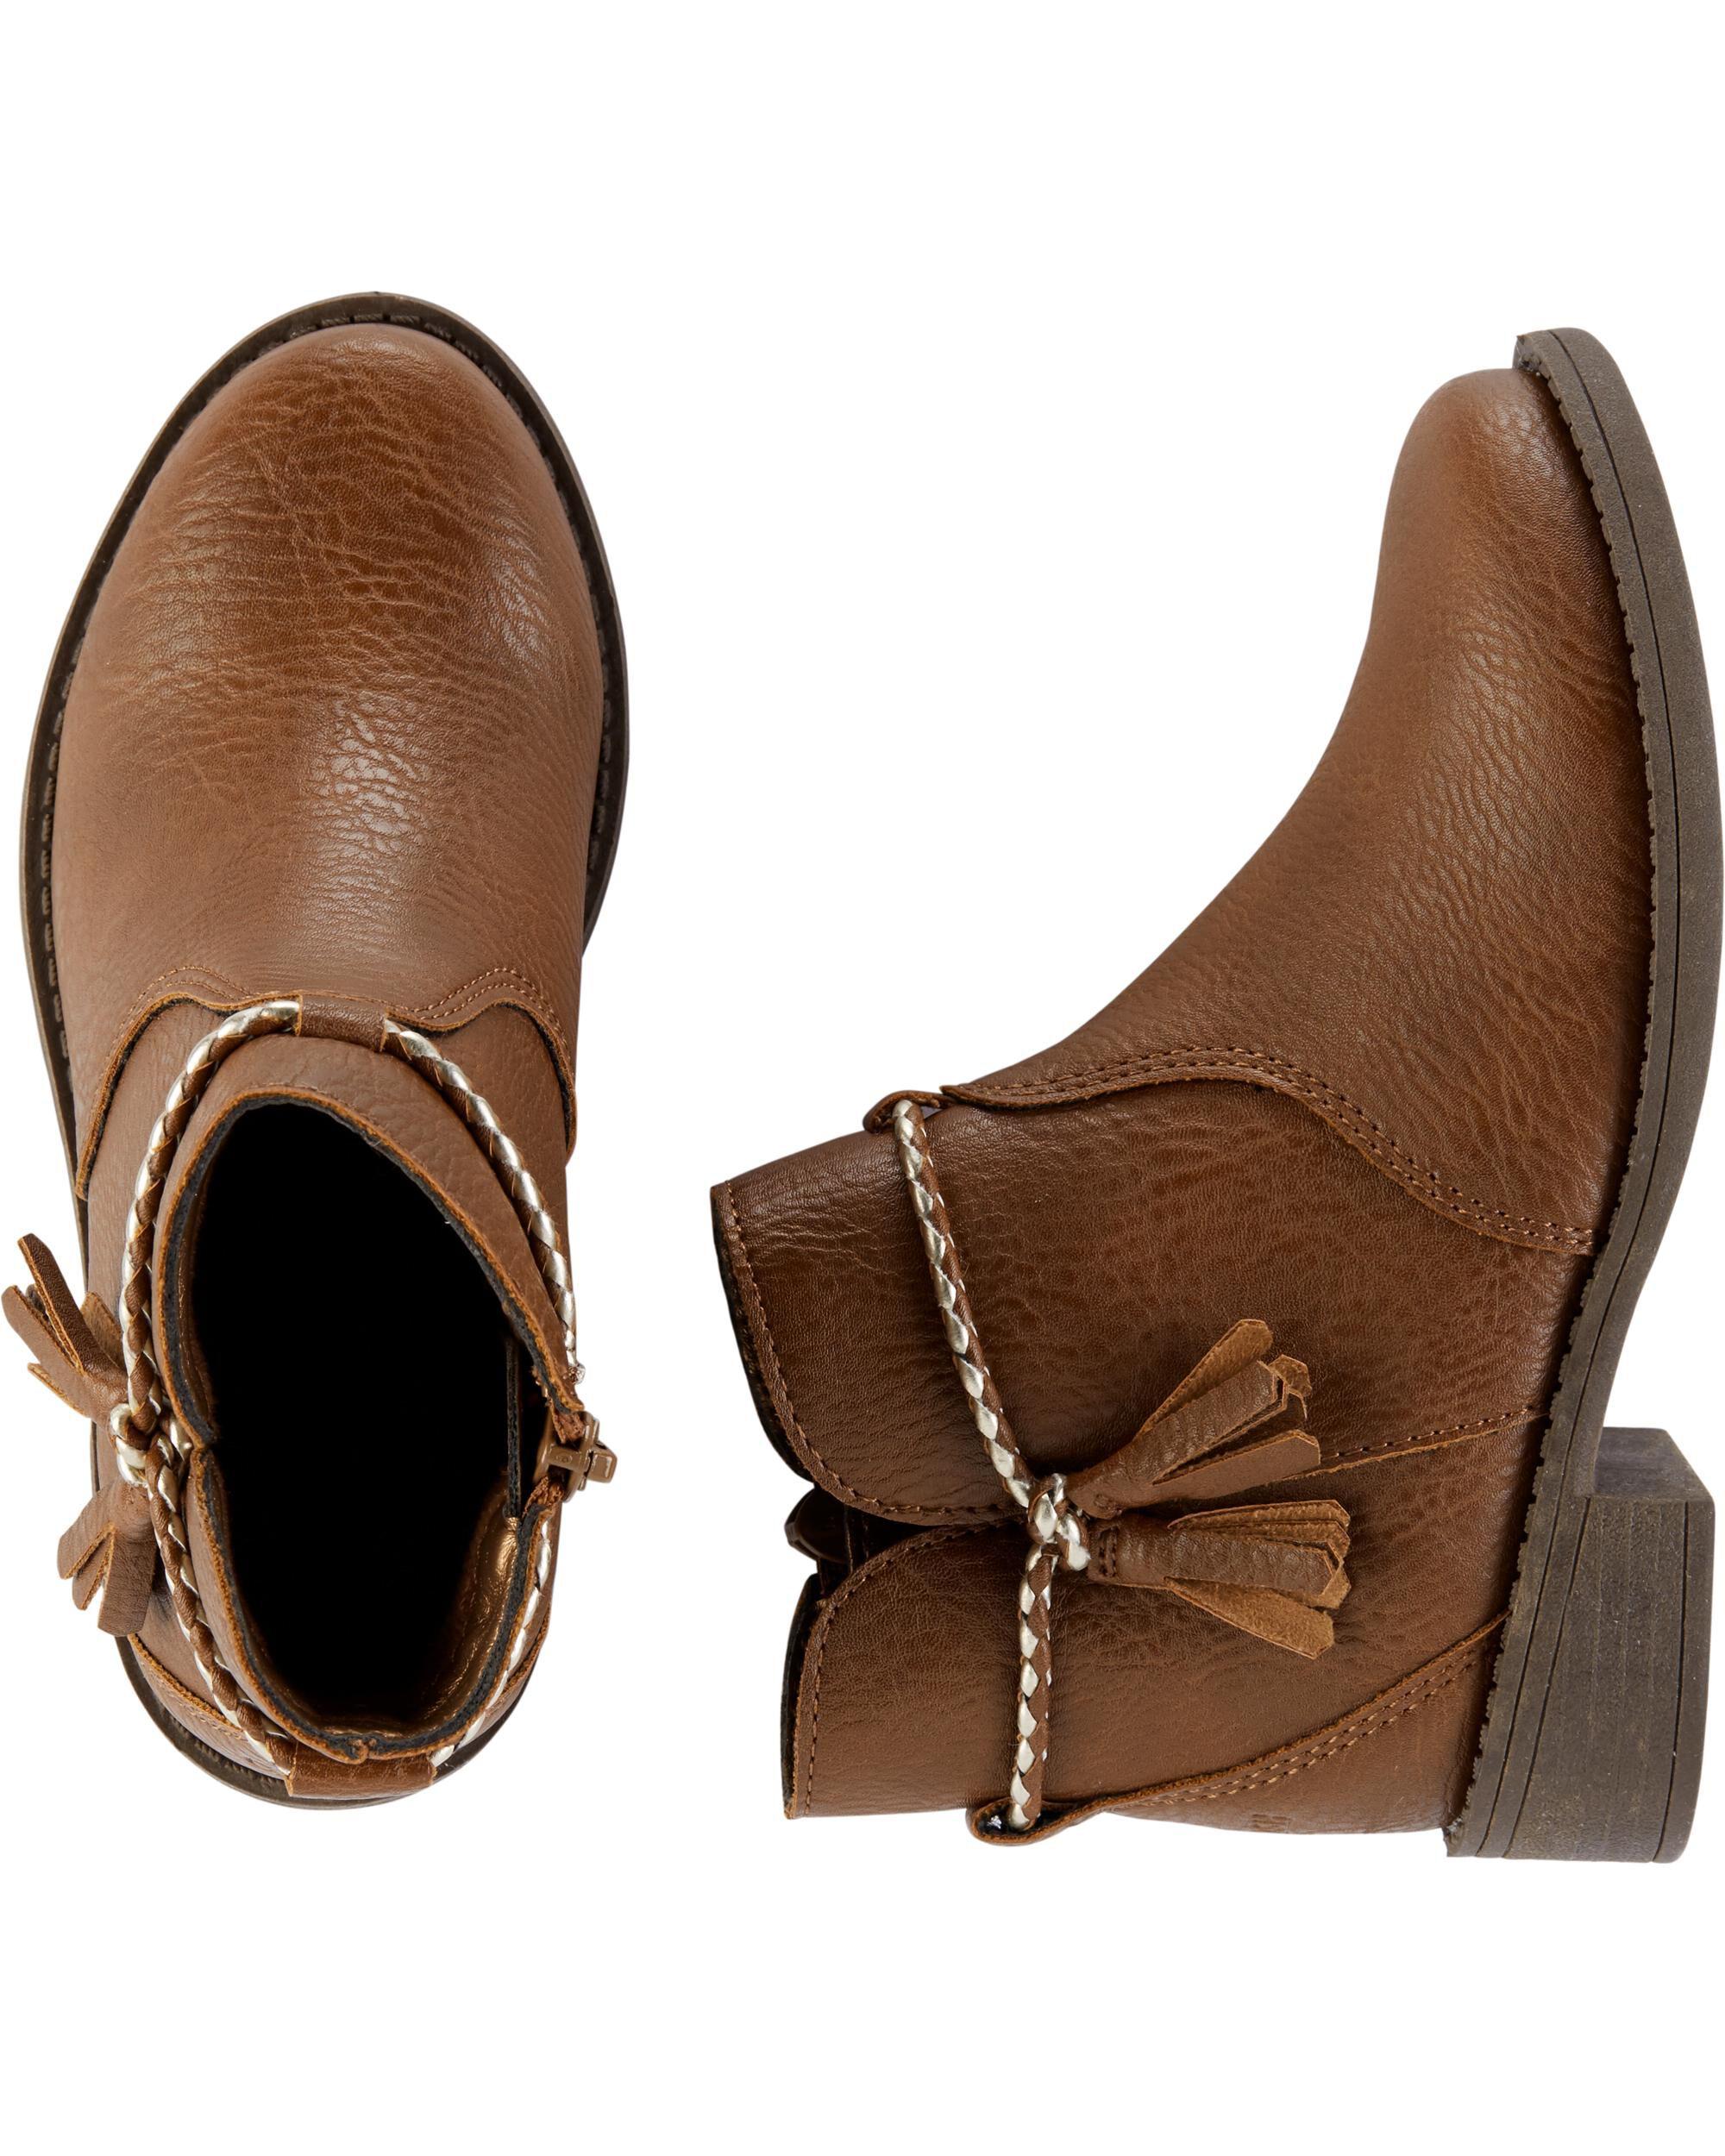 OshKosh Tassel Ankle Boots | carters.com